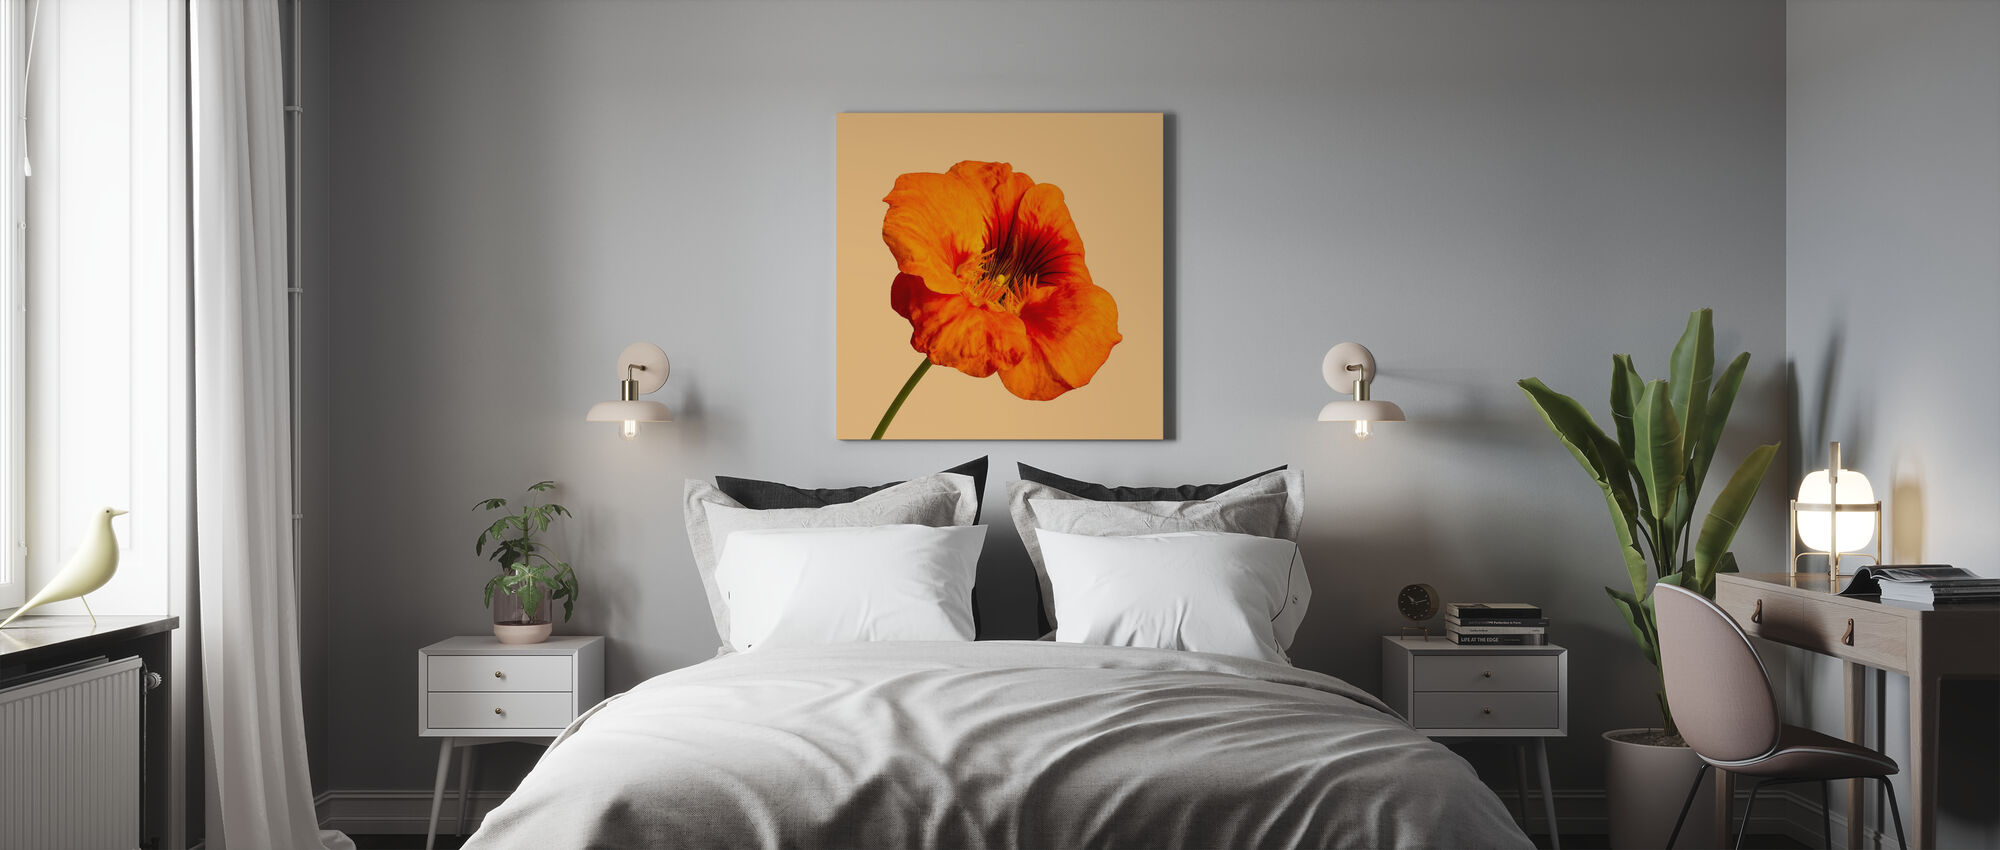 Blooming Hibiscus - Canvas print - Bedroom